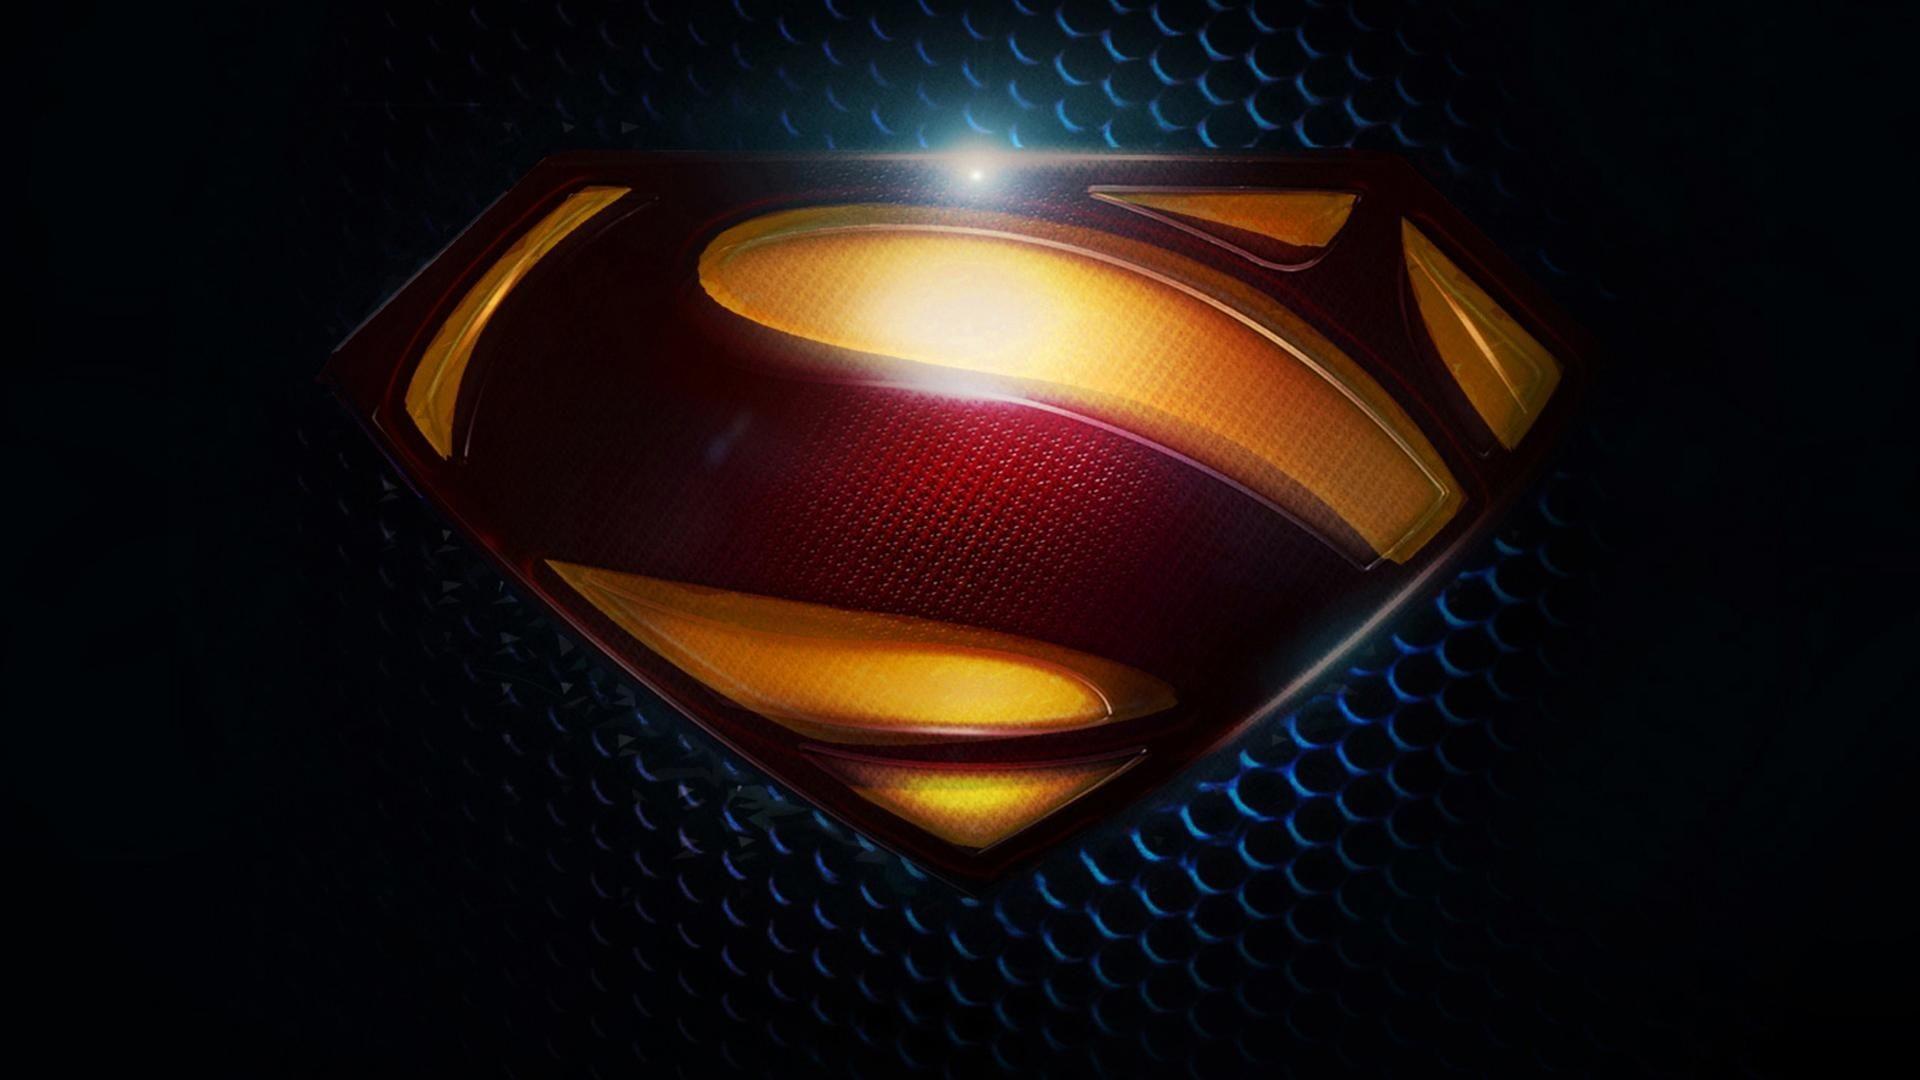 Res: 1920x1080, Superman Logo Wallpaper Mobile ~ Sdeerwallpaper